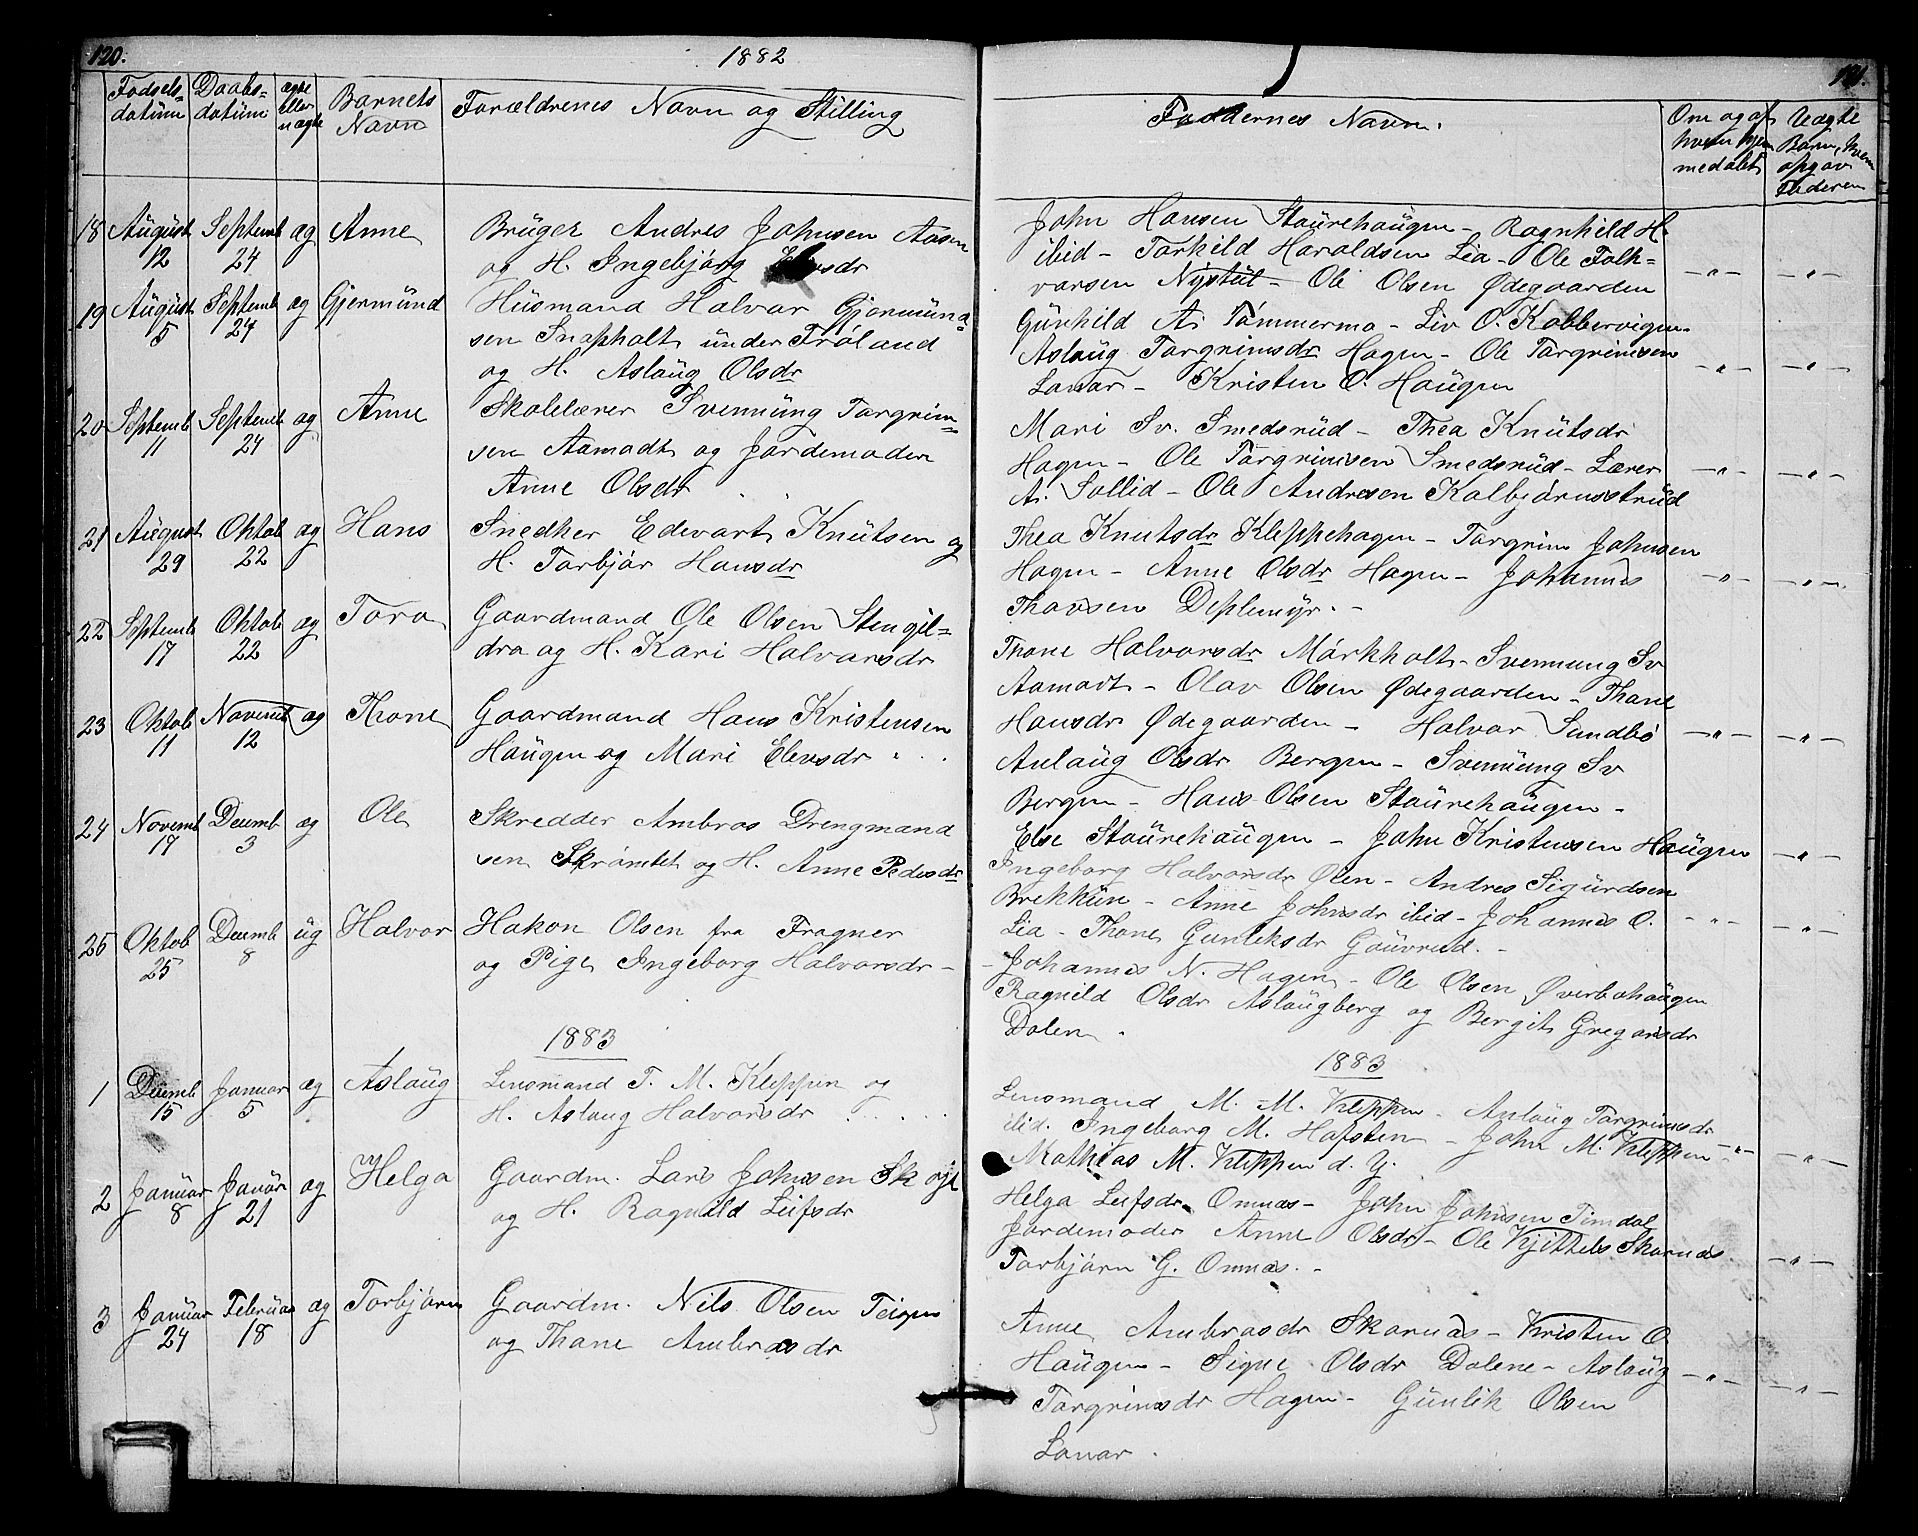 SAKO, Hjartdal kirkebøker, G/Gb/L0002: Klokkerbok nr. II 2, 1854-1884, s. 120-121